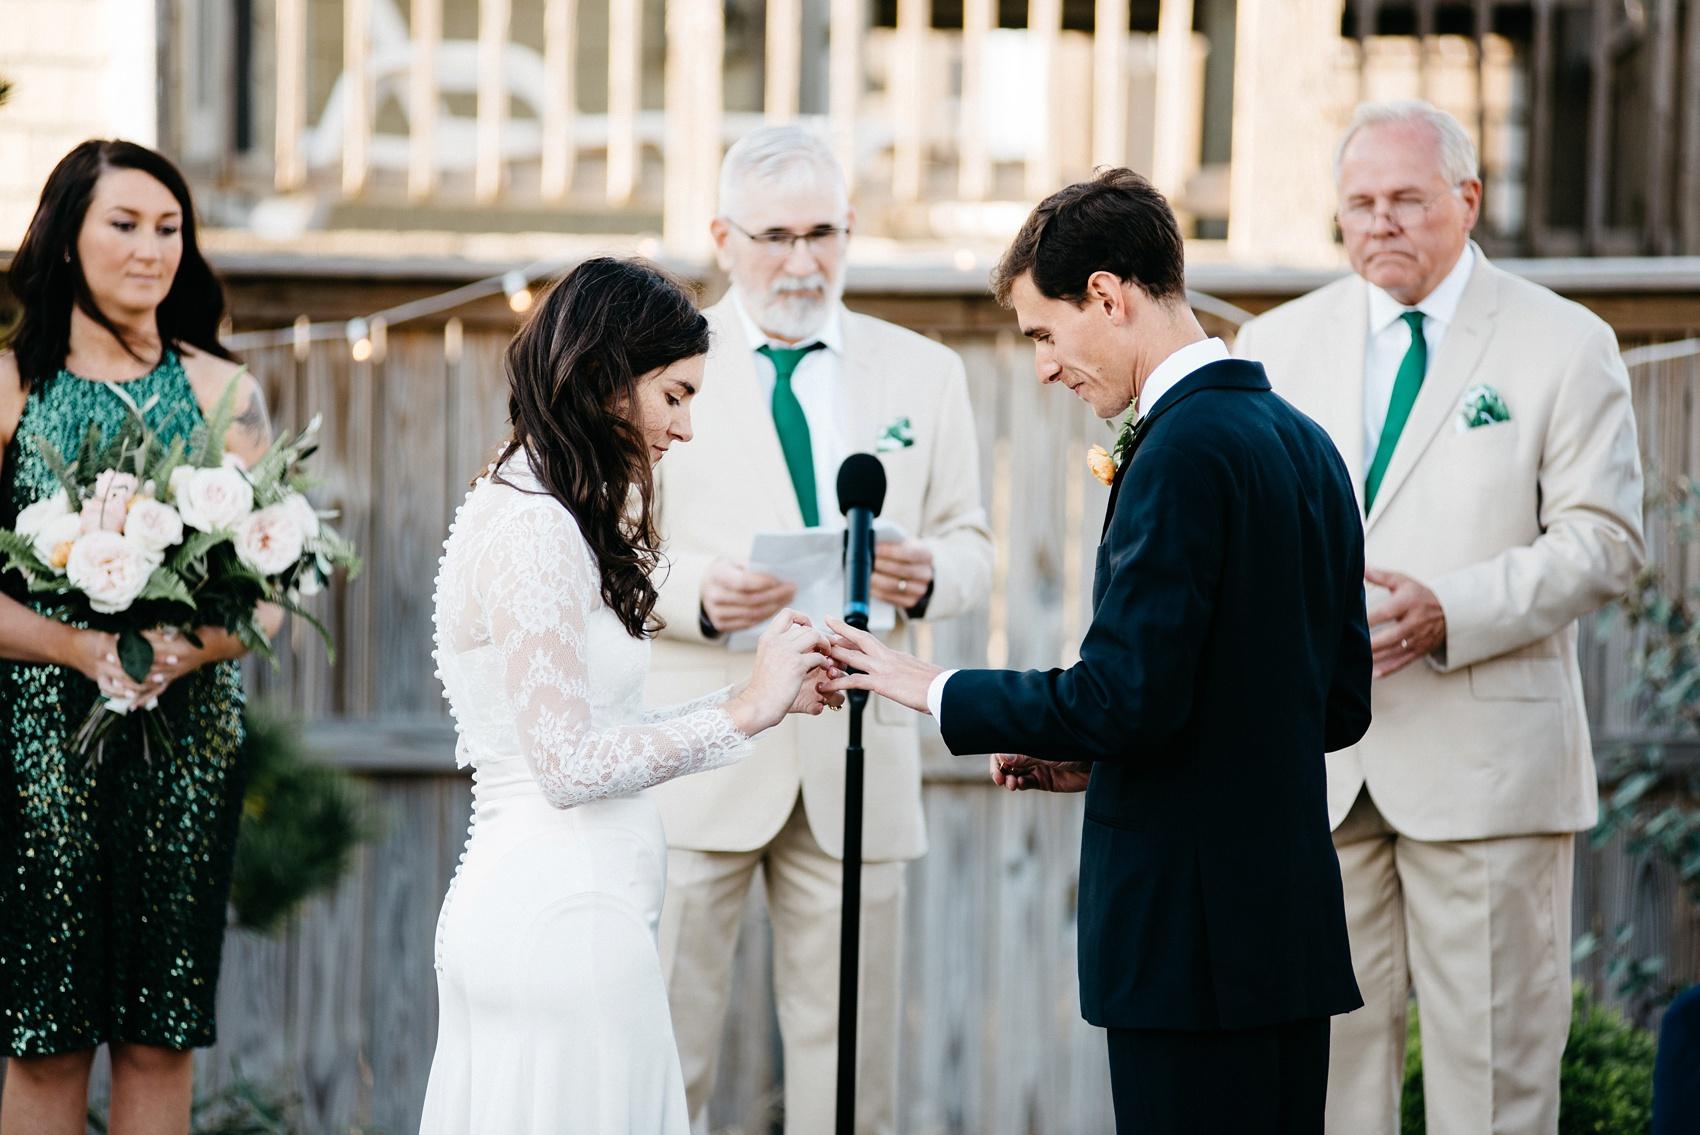 outerbanks_wedding_photographer_1284.jpg